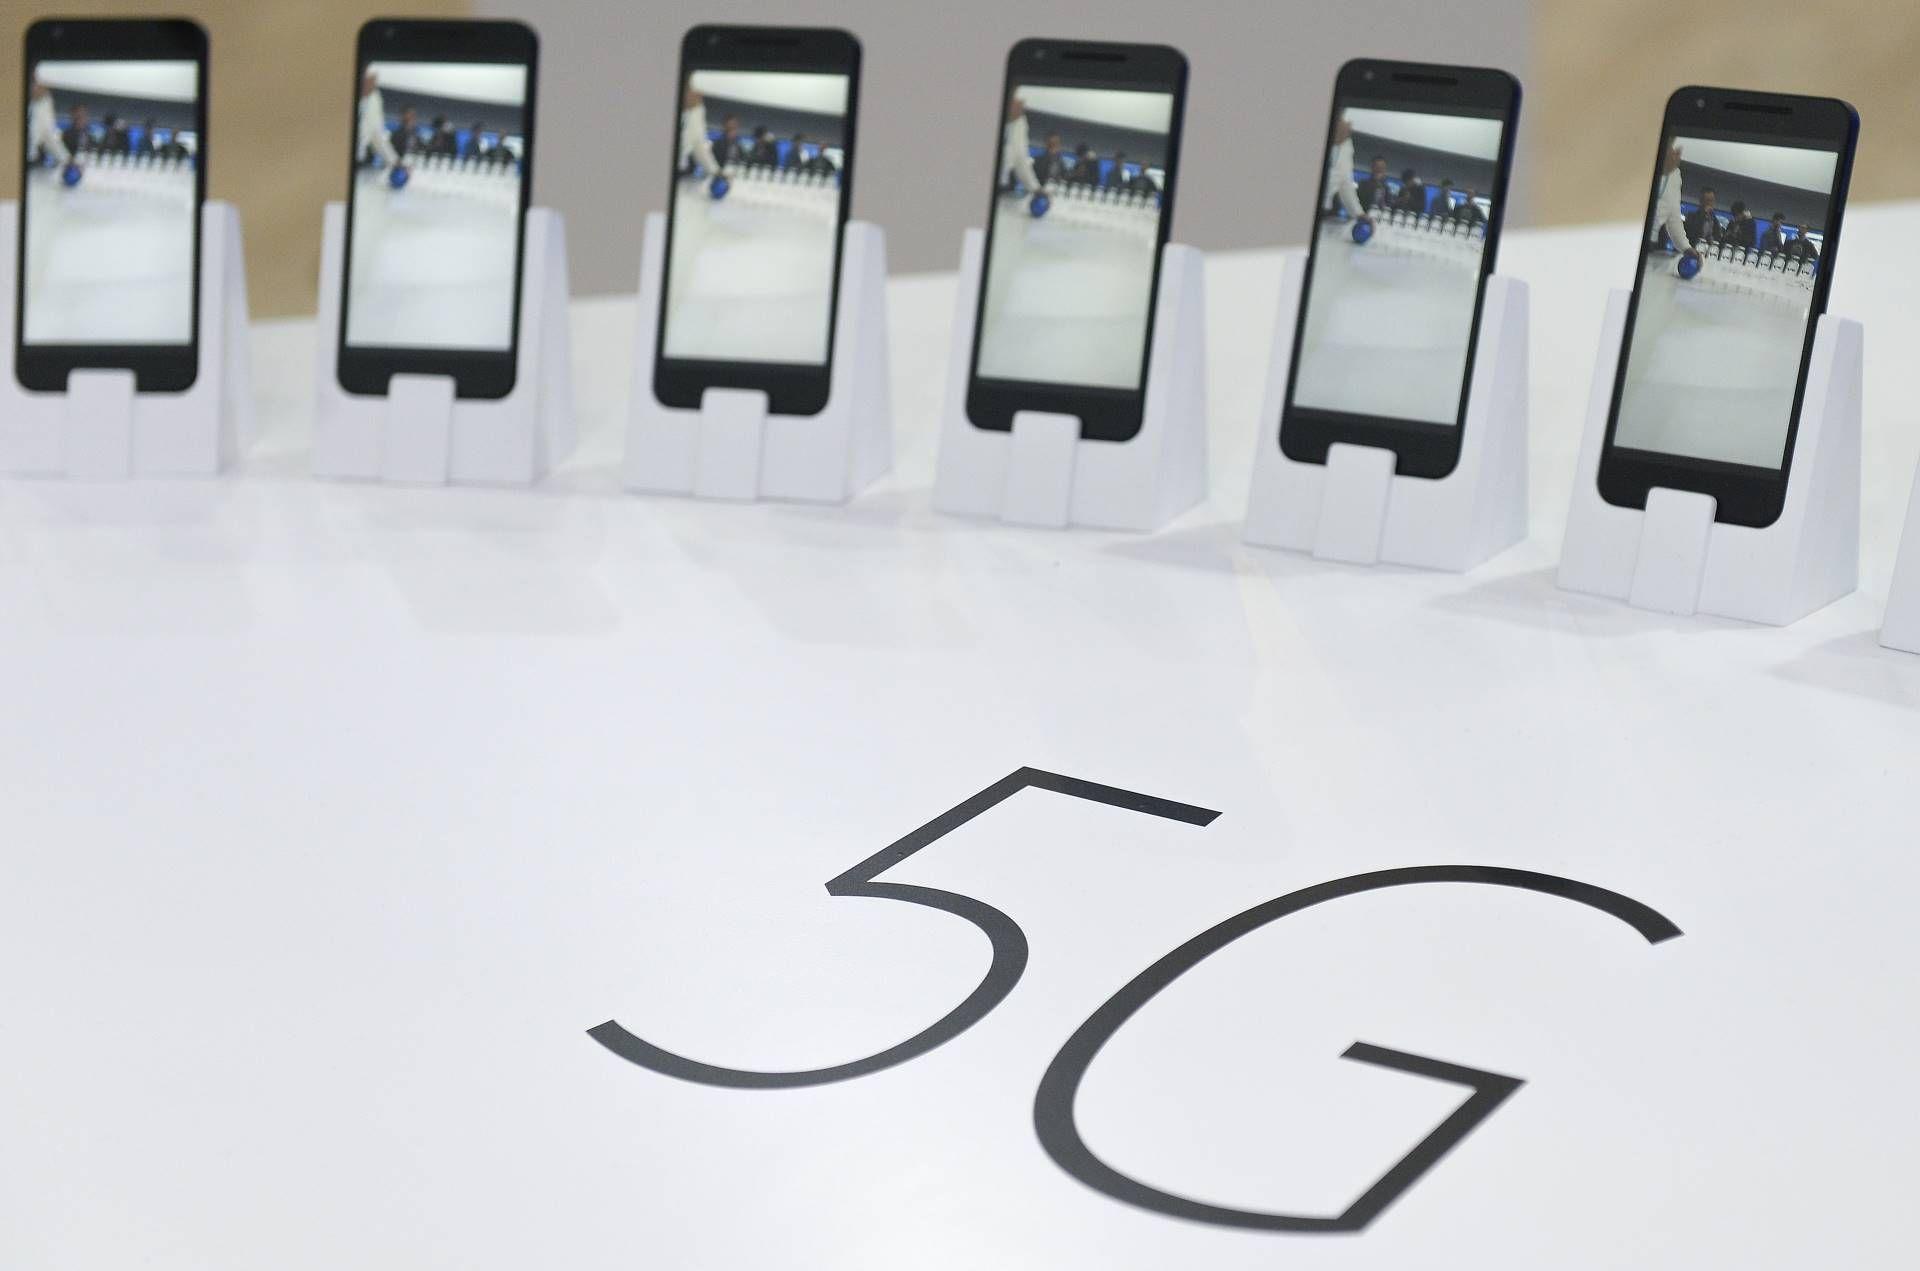 Handset, Smartphone, Mobile data